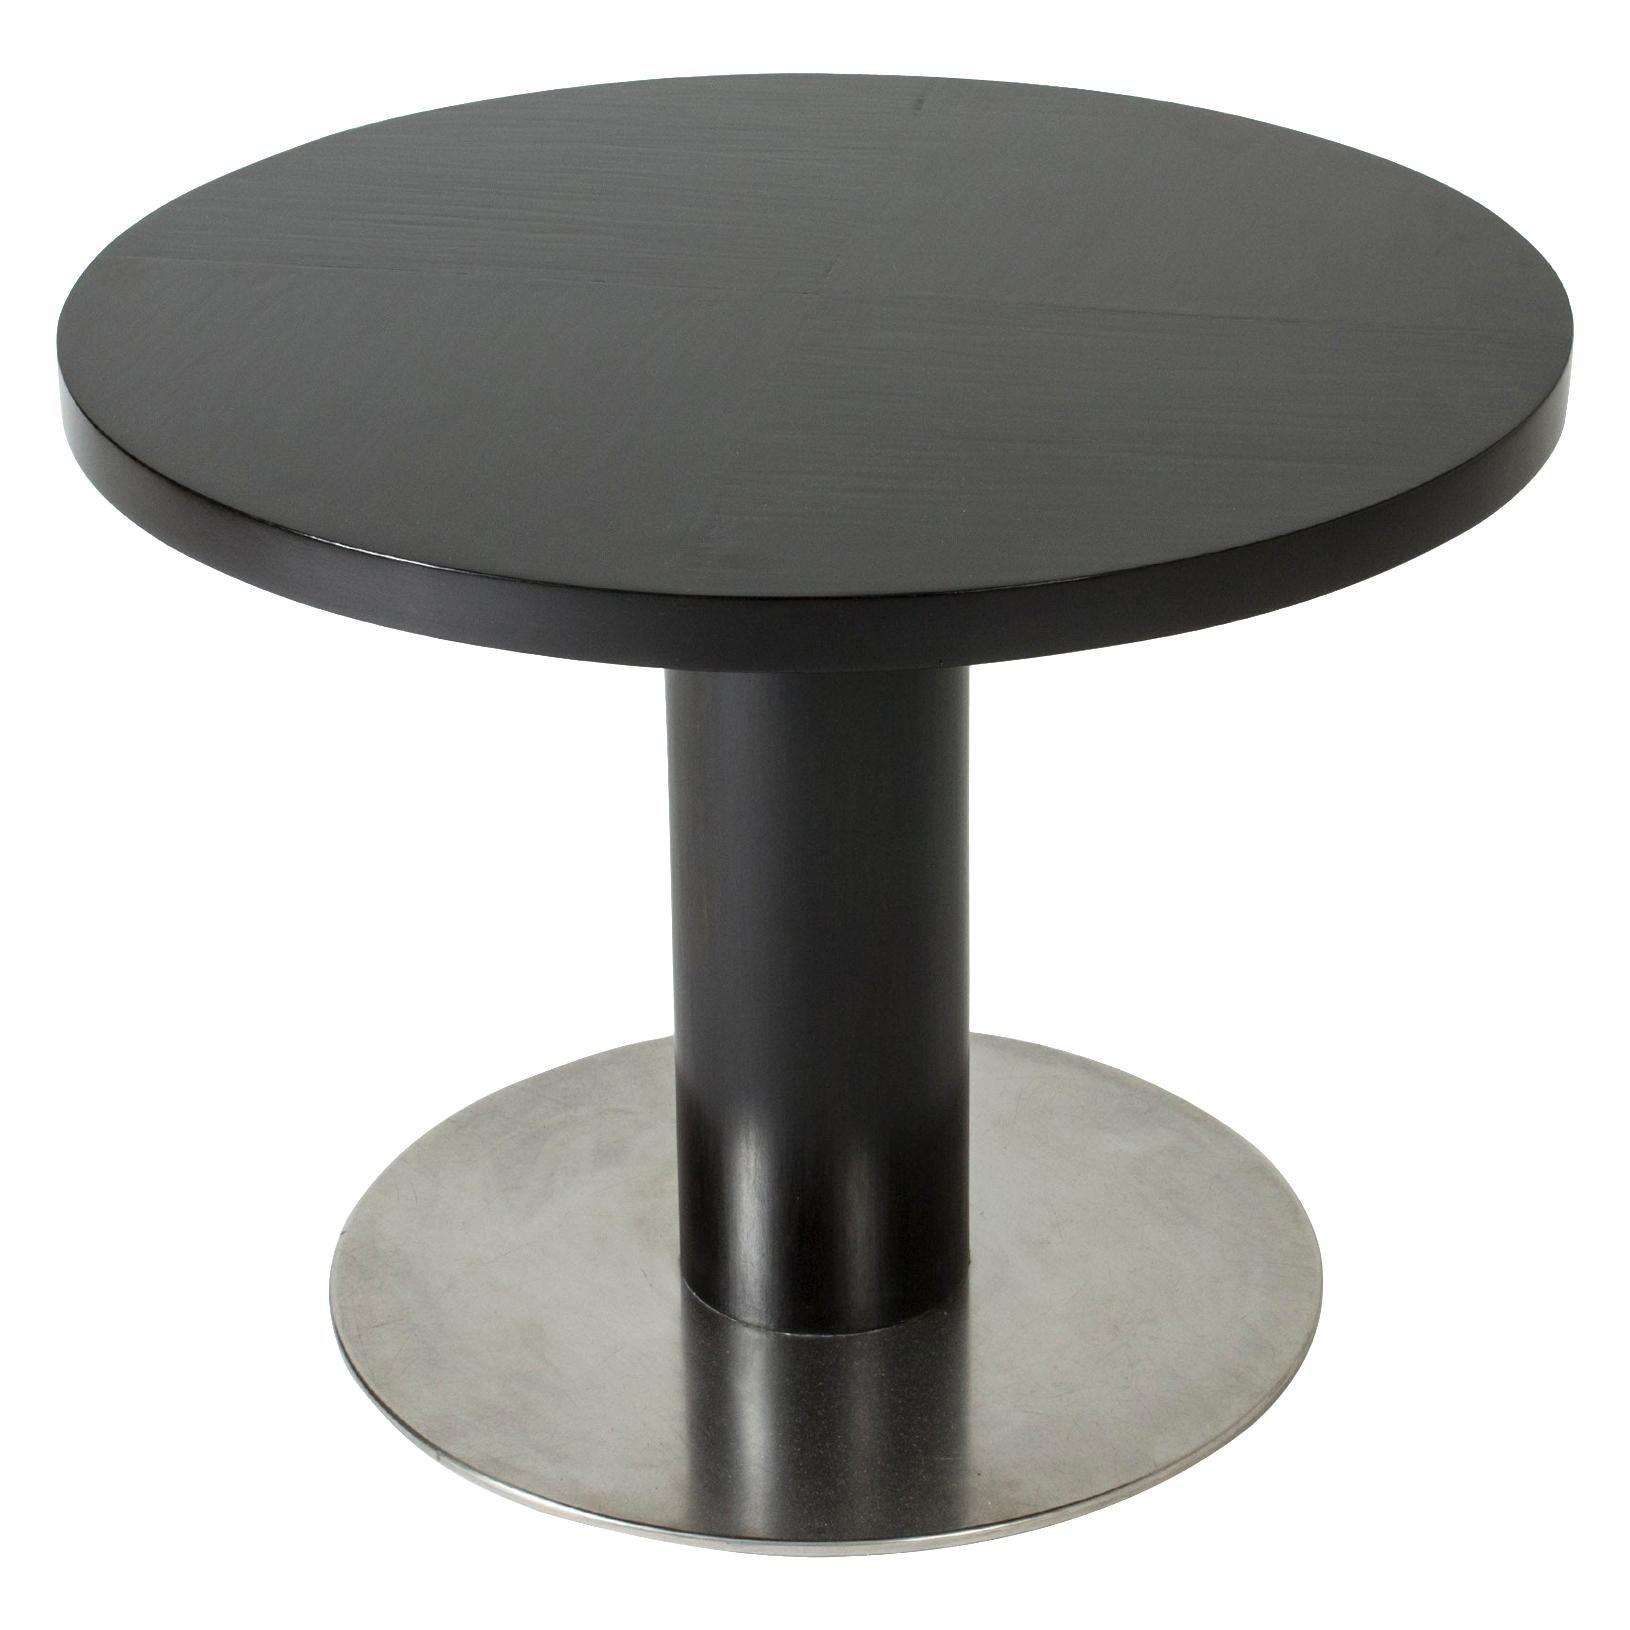 """Typenko"" Occasional Table by Axel Einar Hjorth for Nordiska Kompaniet, Sweden"